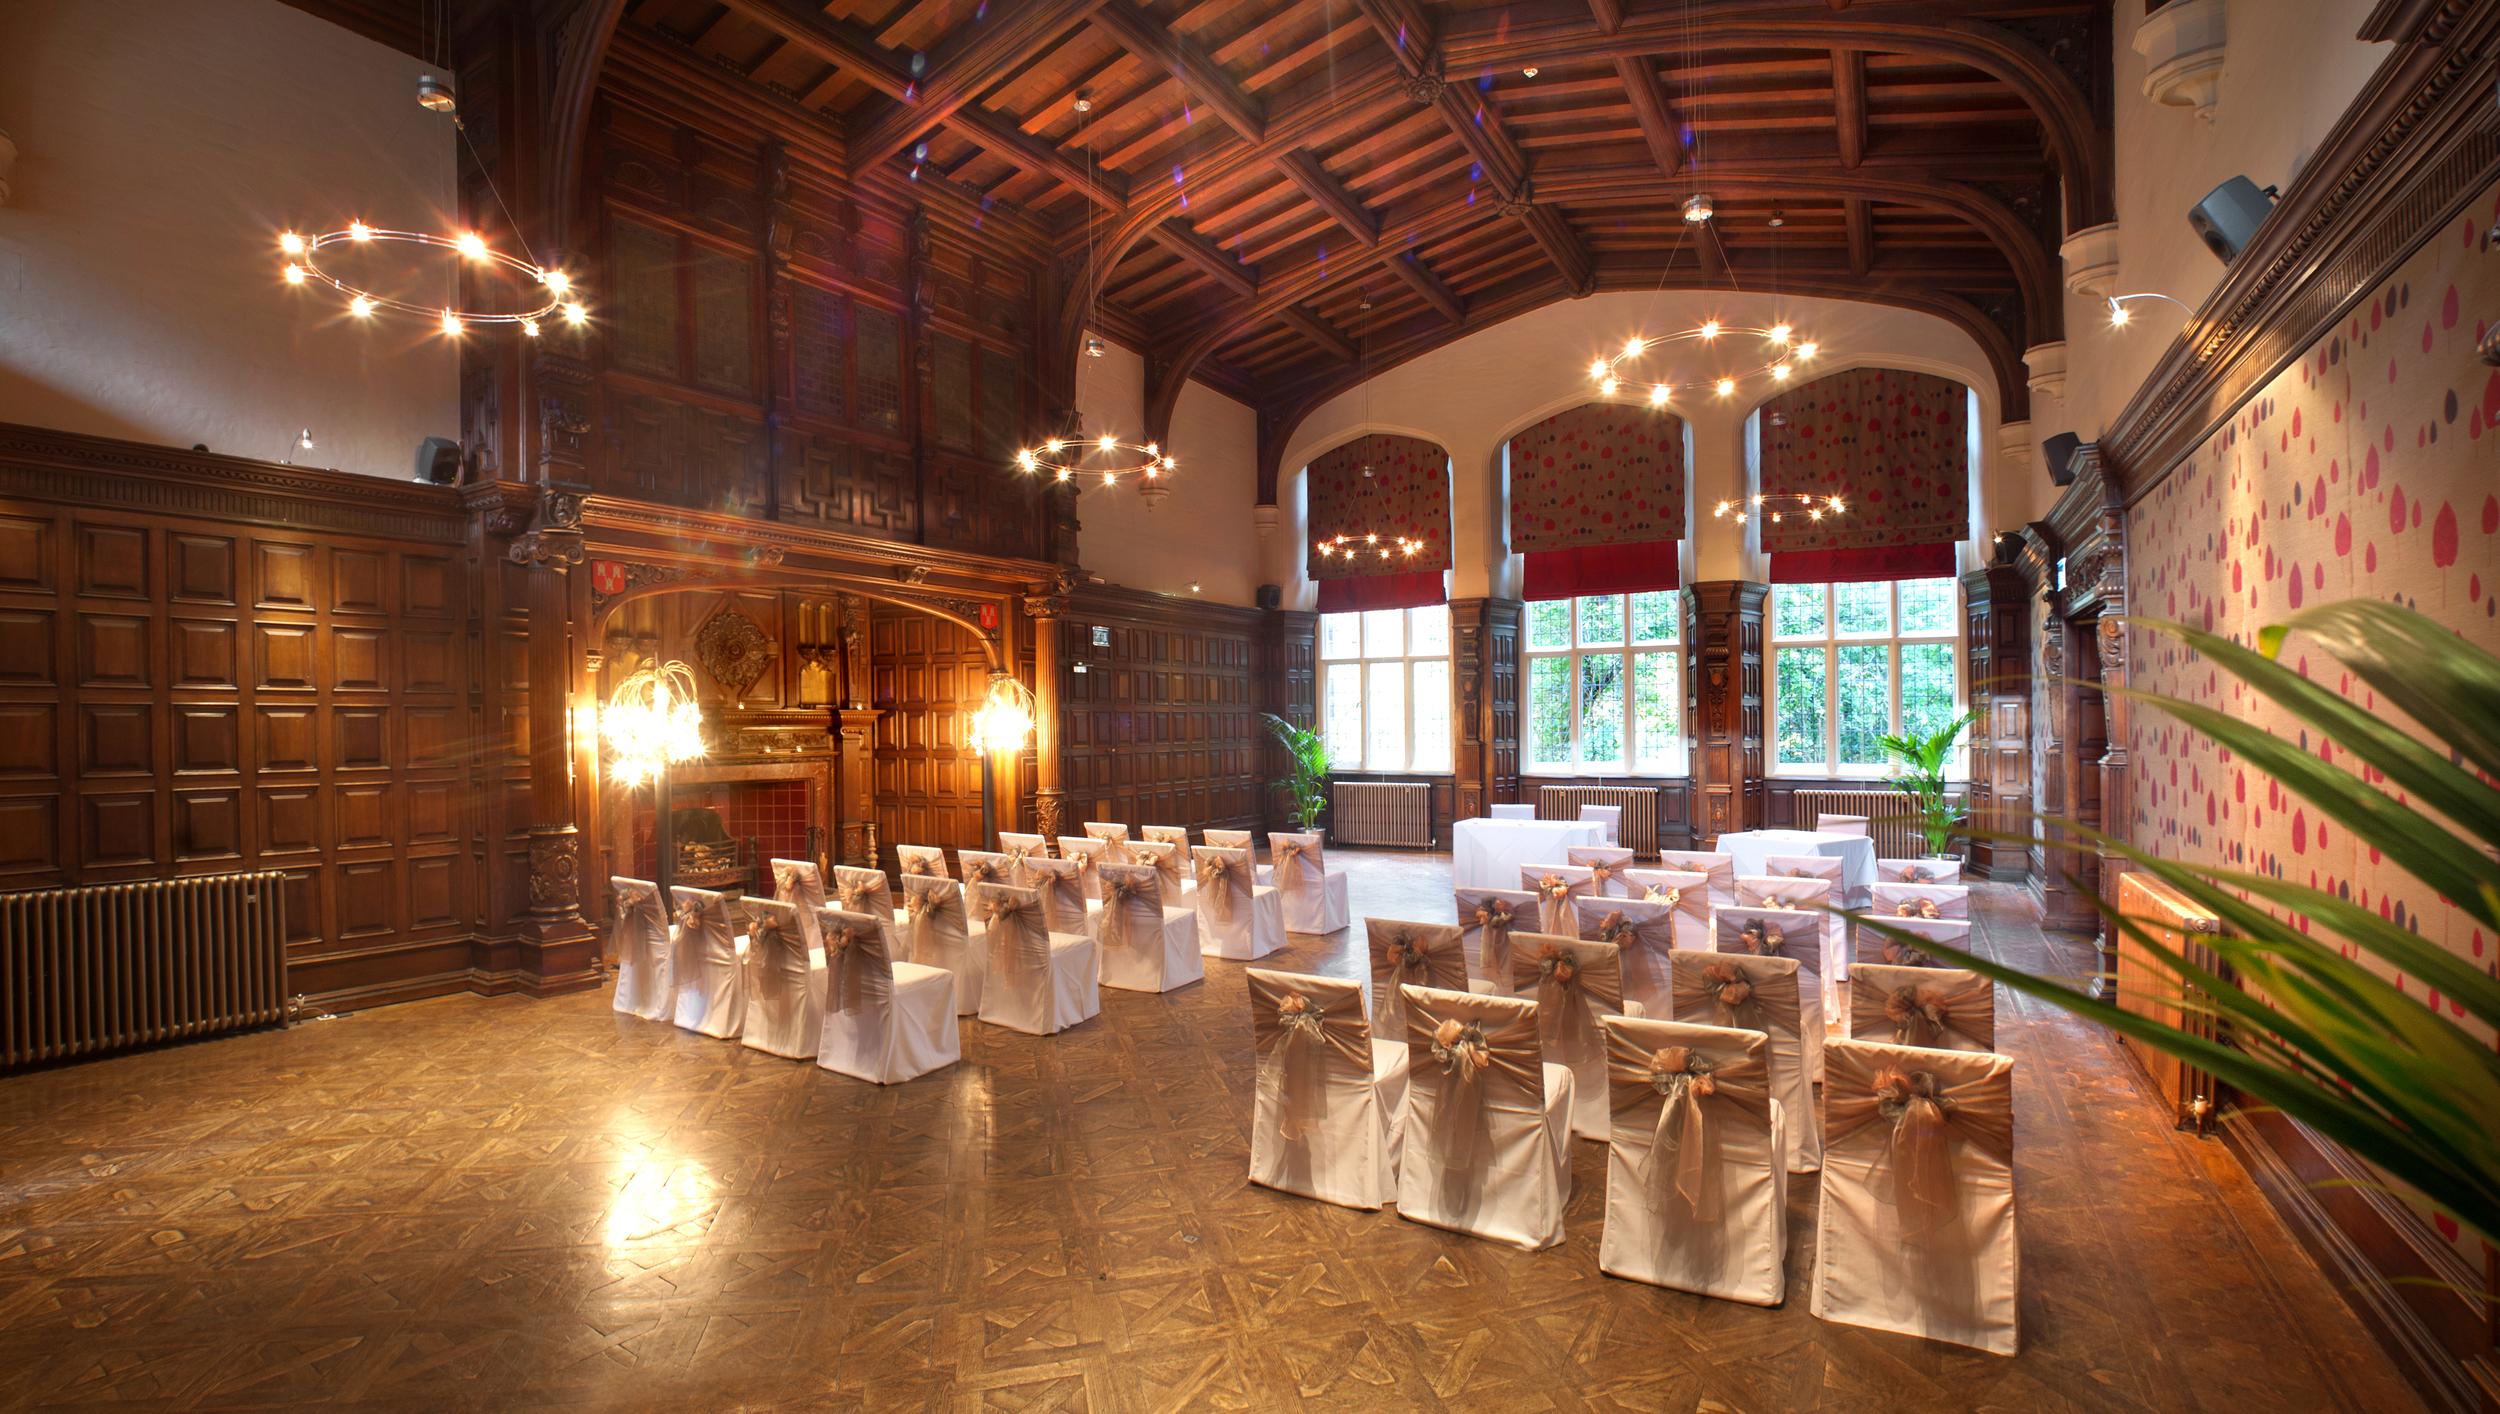 Jesmond Dene House - The Great Hall